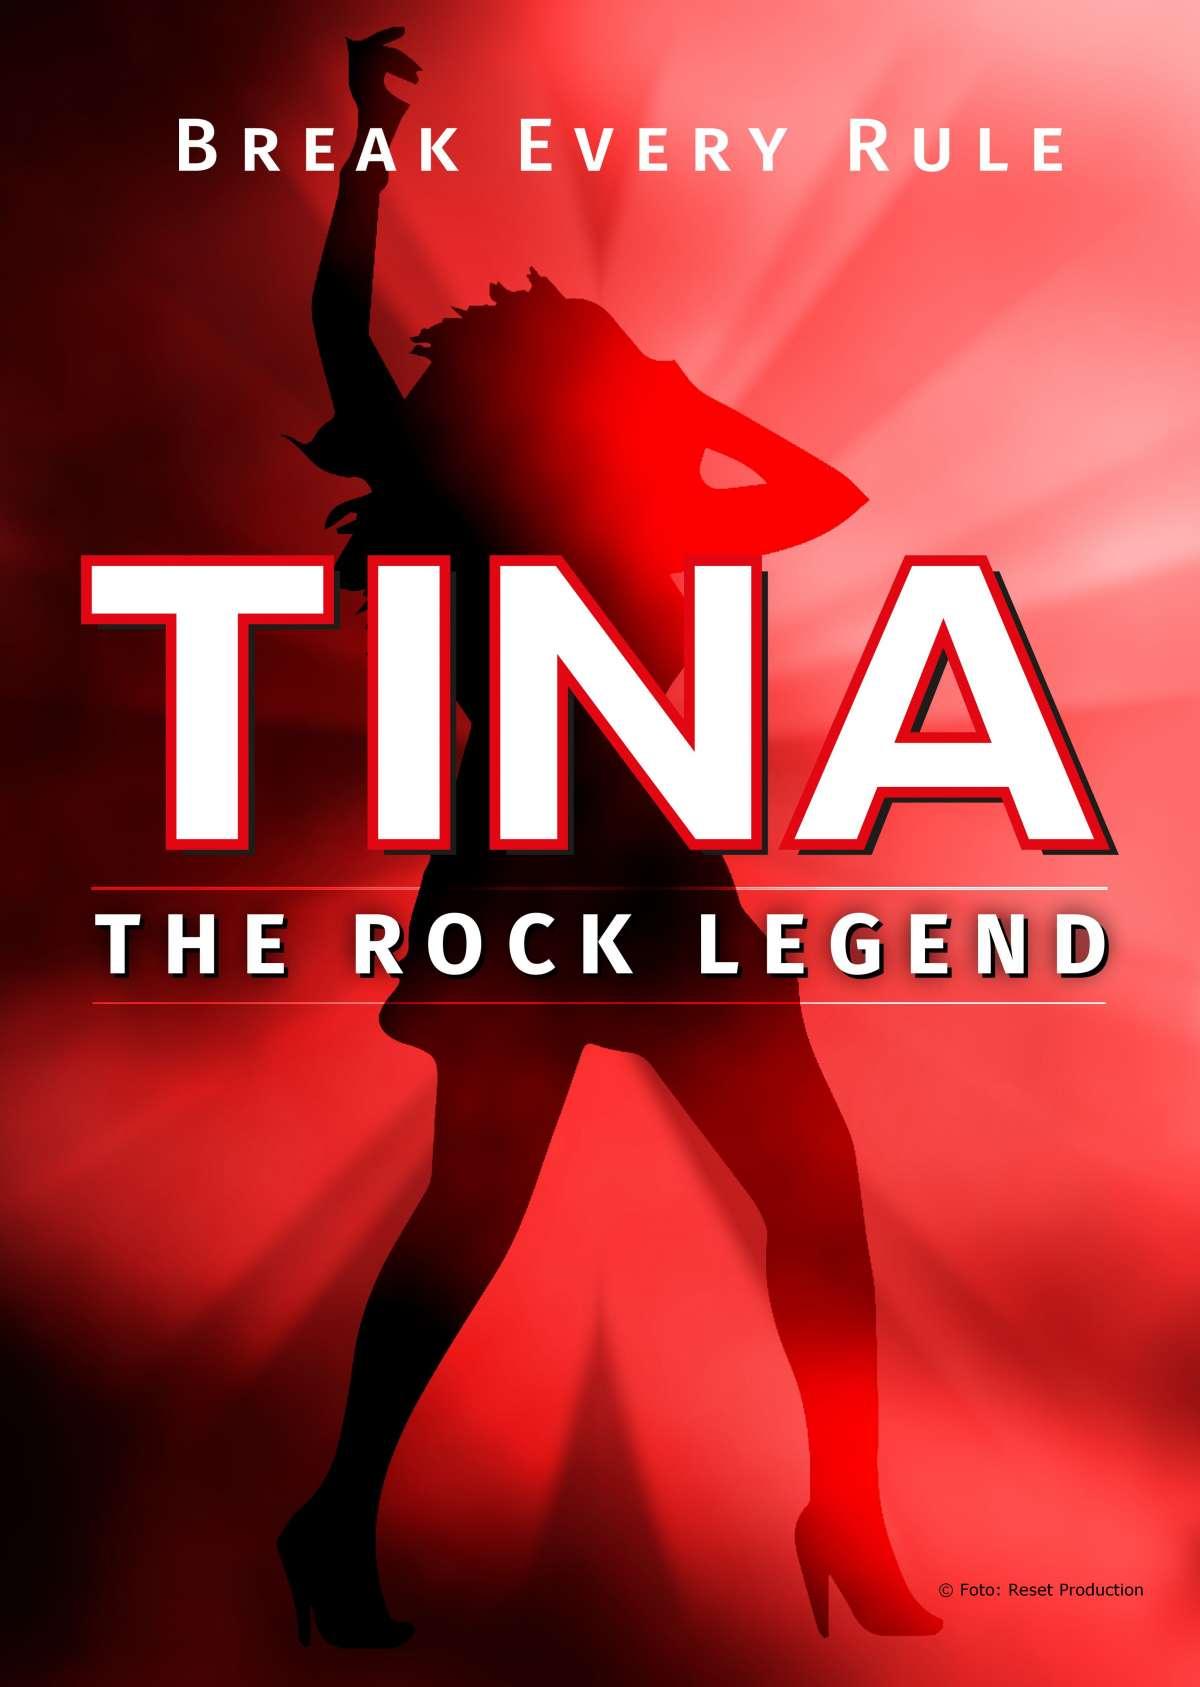 TINA - The Rock Legend / NACHHOLTERMIN / ERNEUT VERLEGT